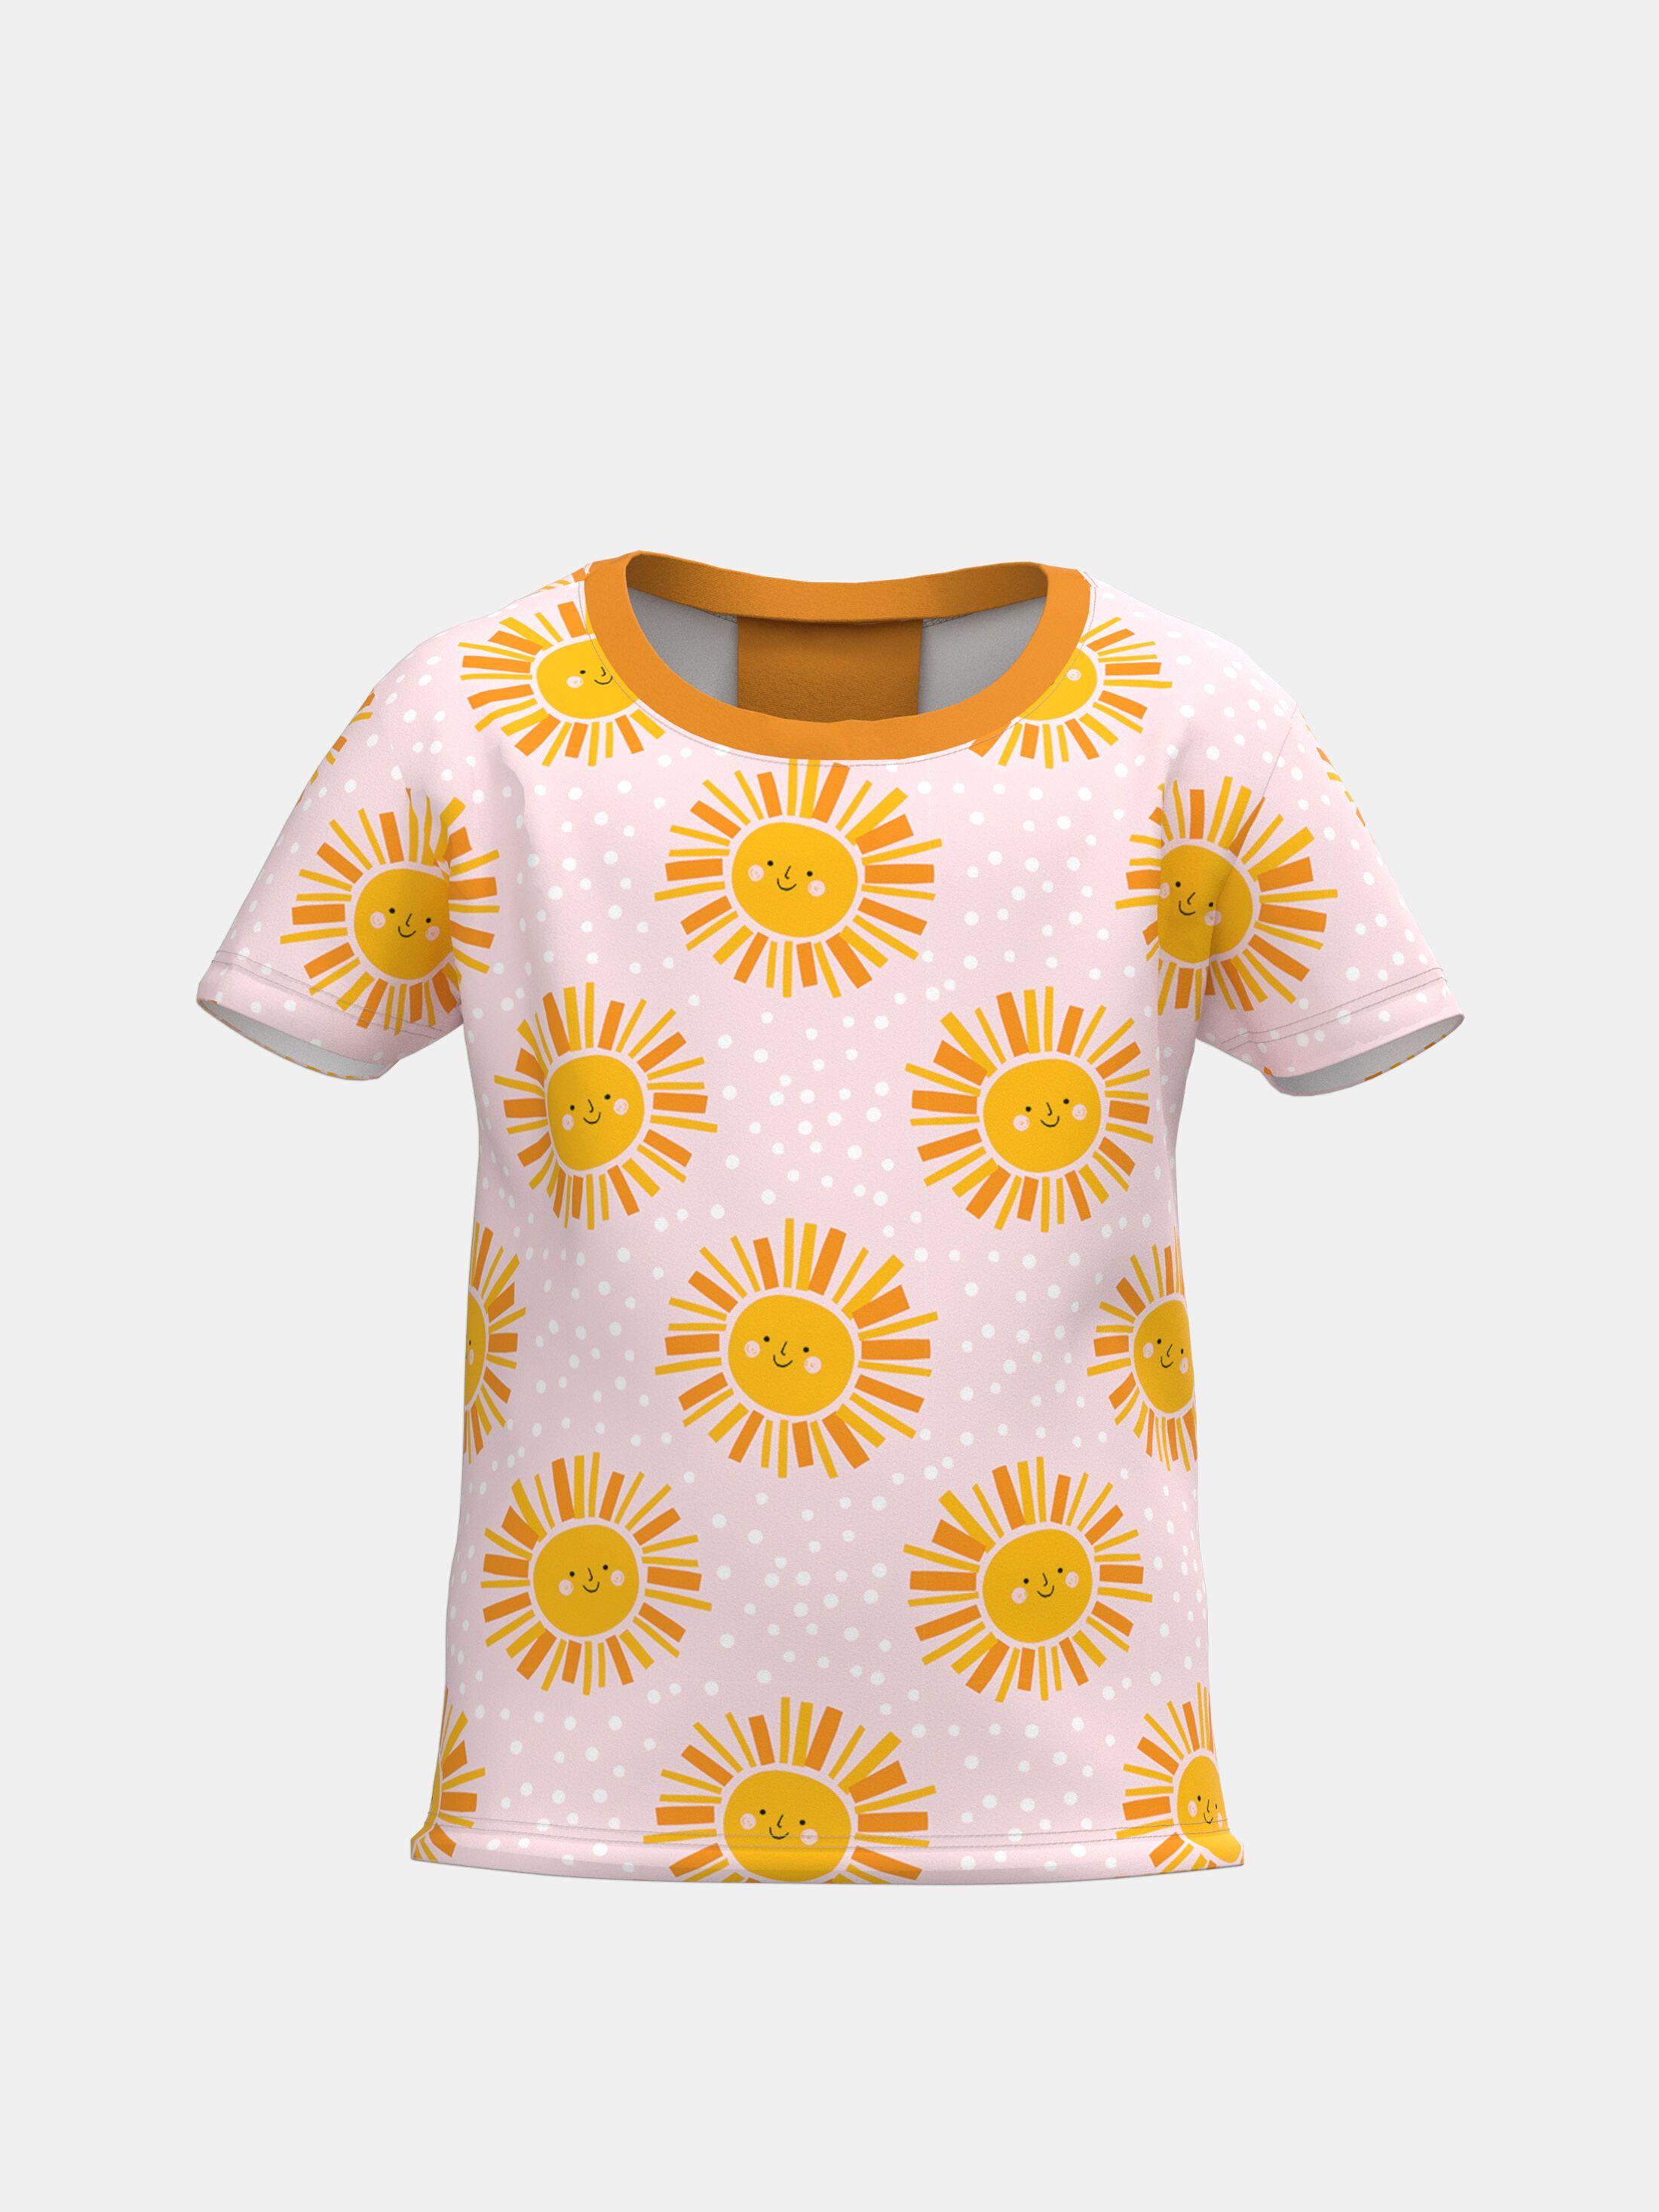 Custom Children's T-Shirts Made to order